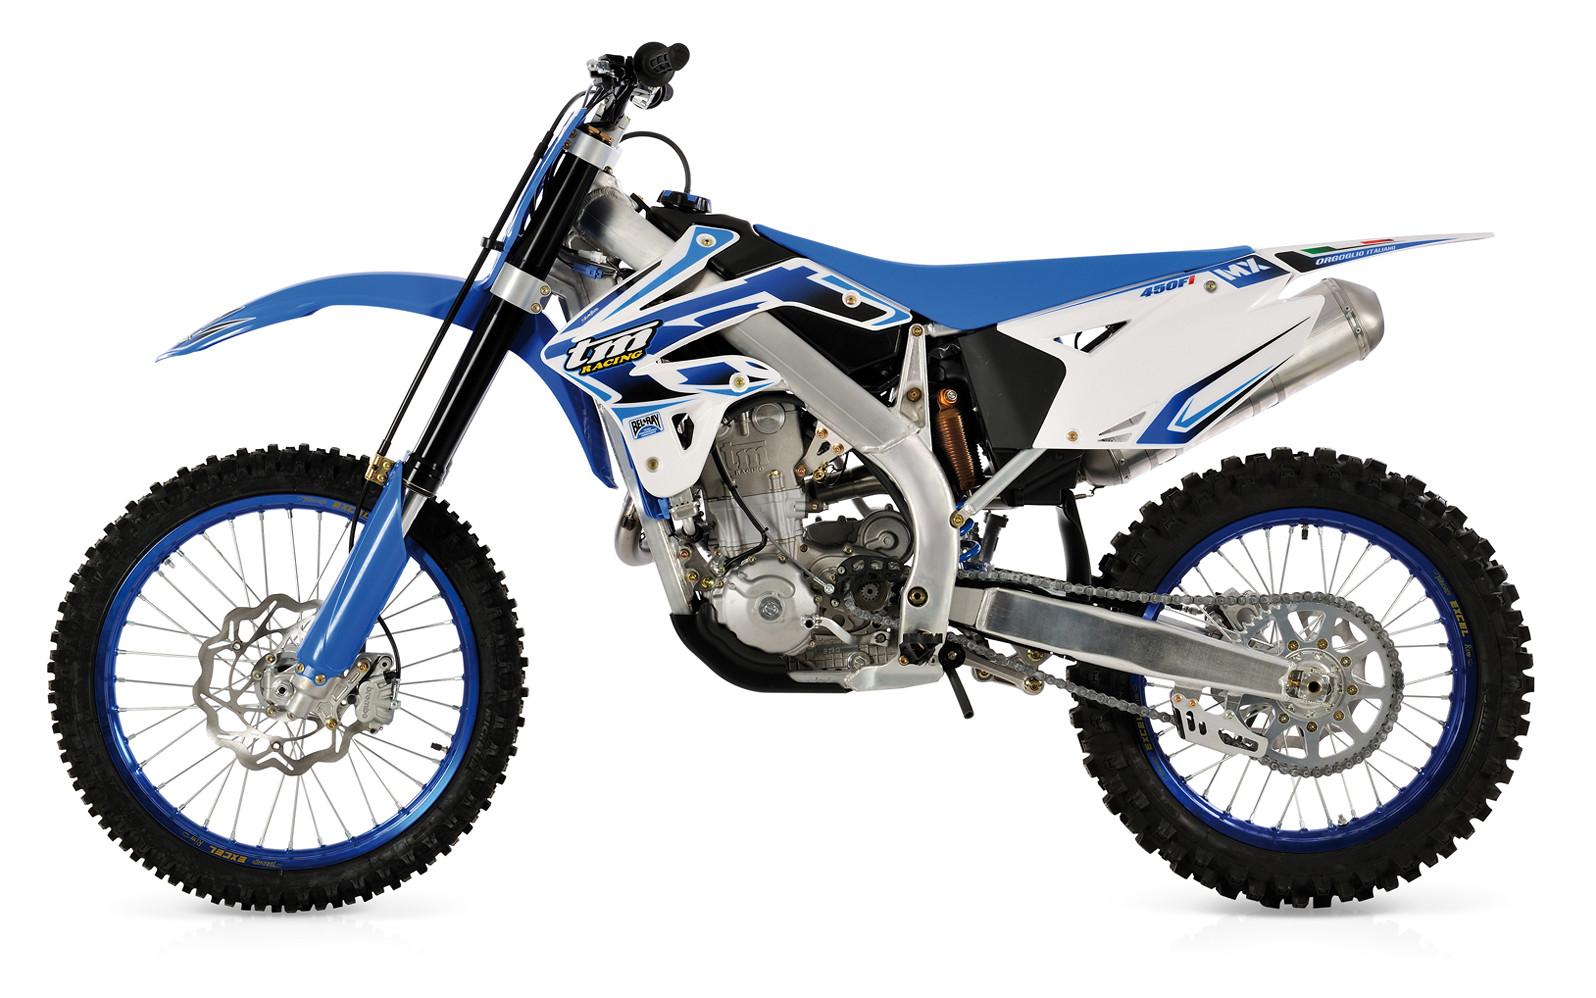 Tm Dirt Bikes >> 2013 TM Racing MX 450 Fi - Reviews, Comparisons, Specs ...